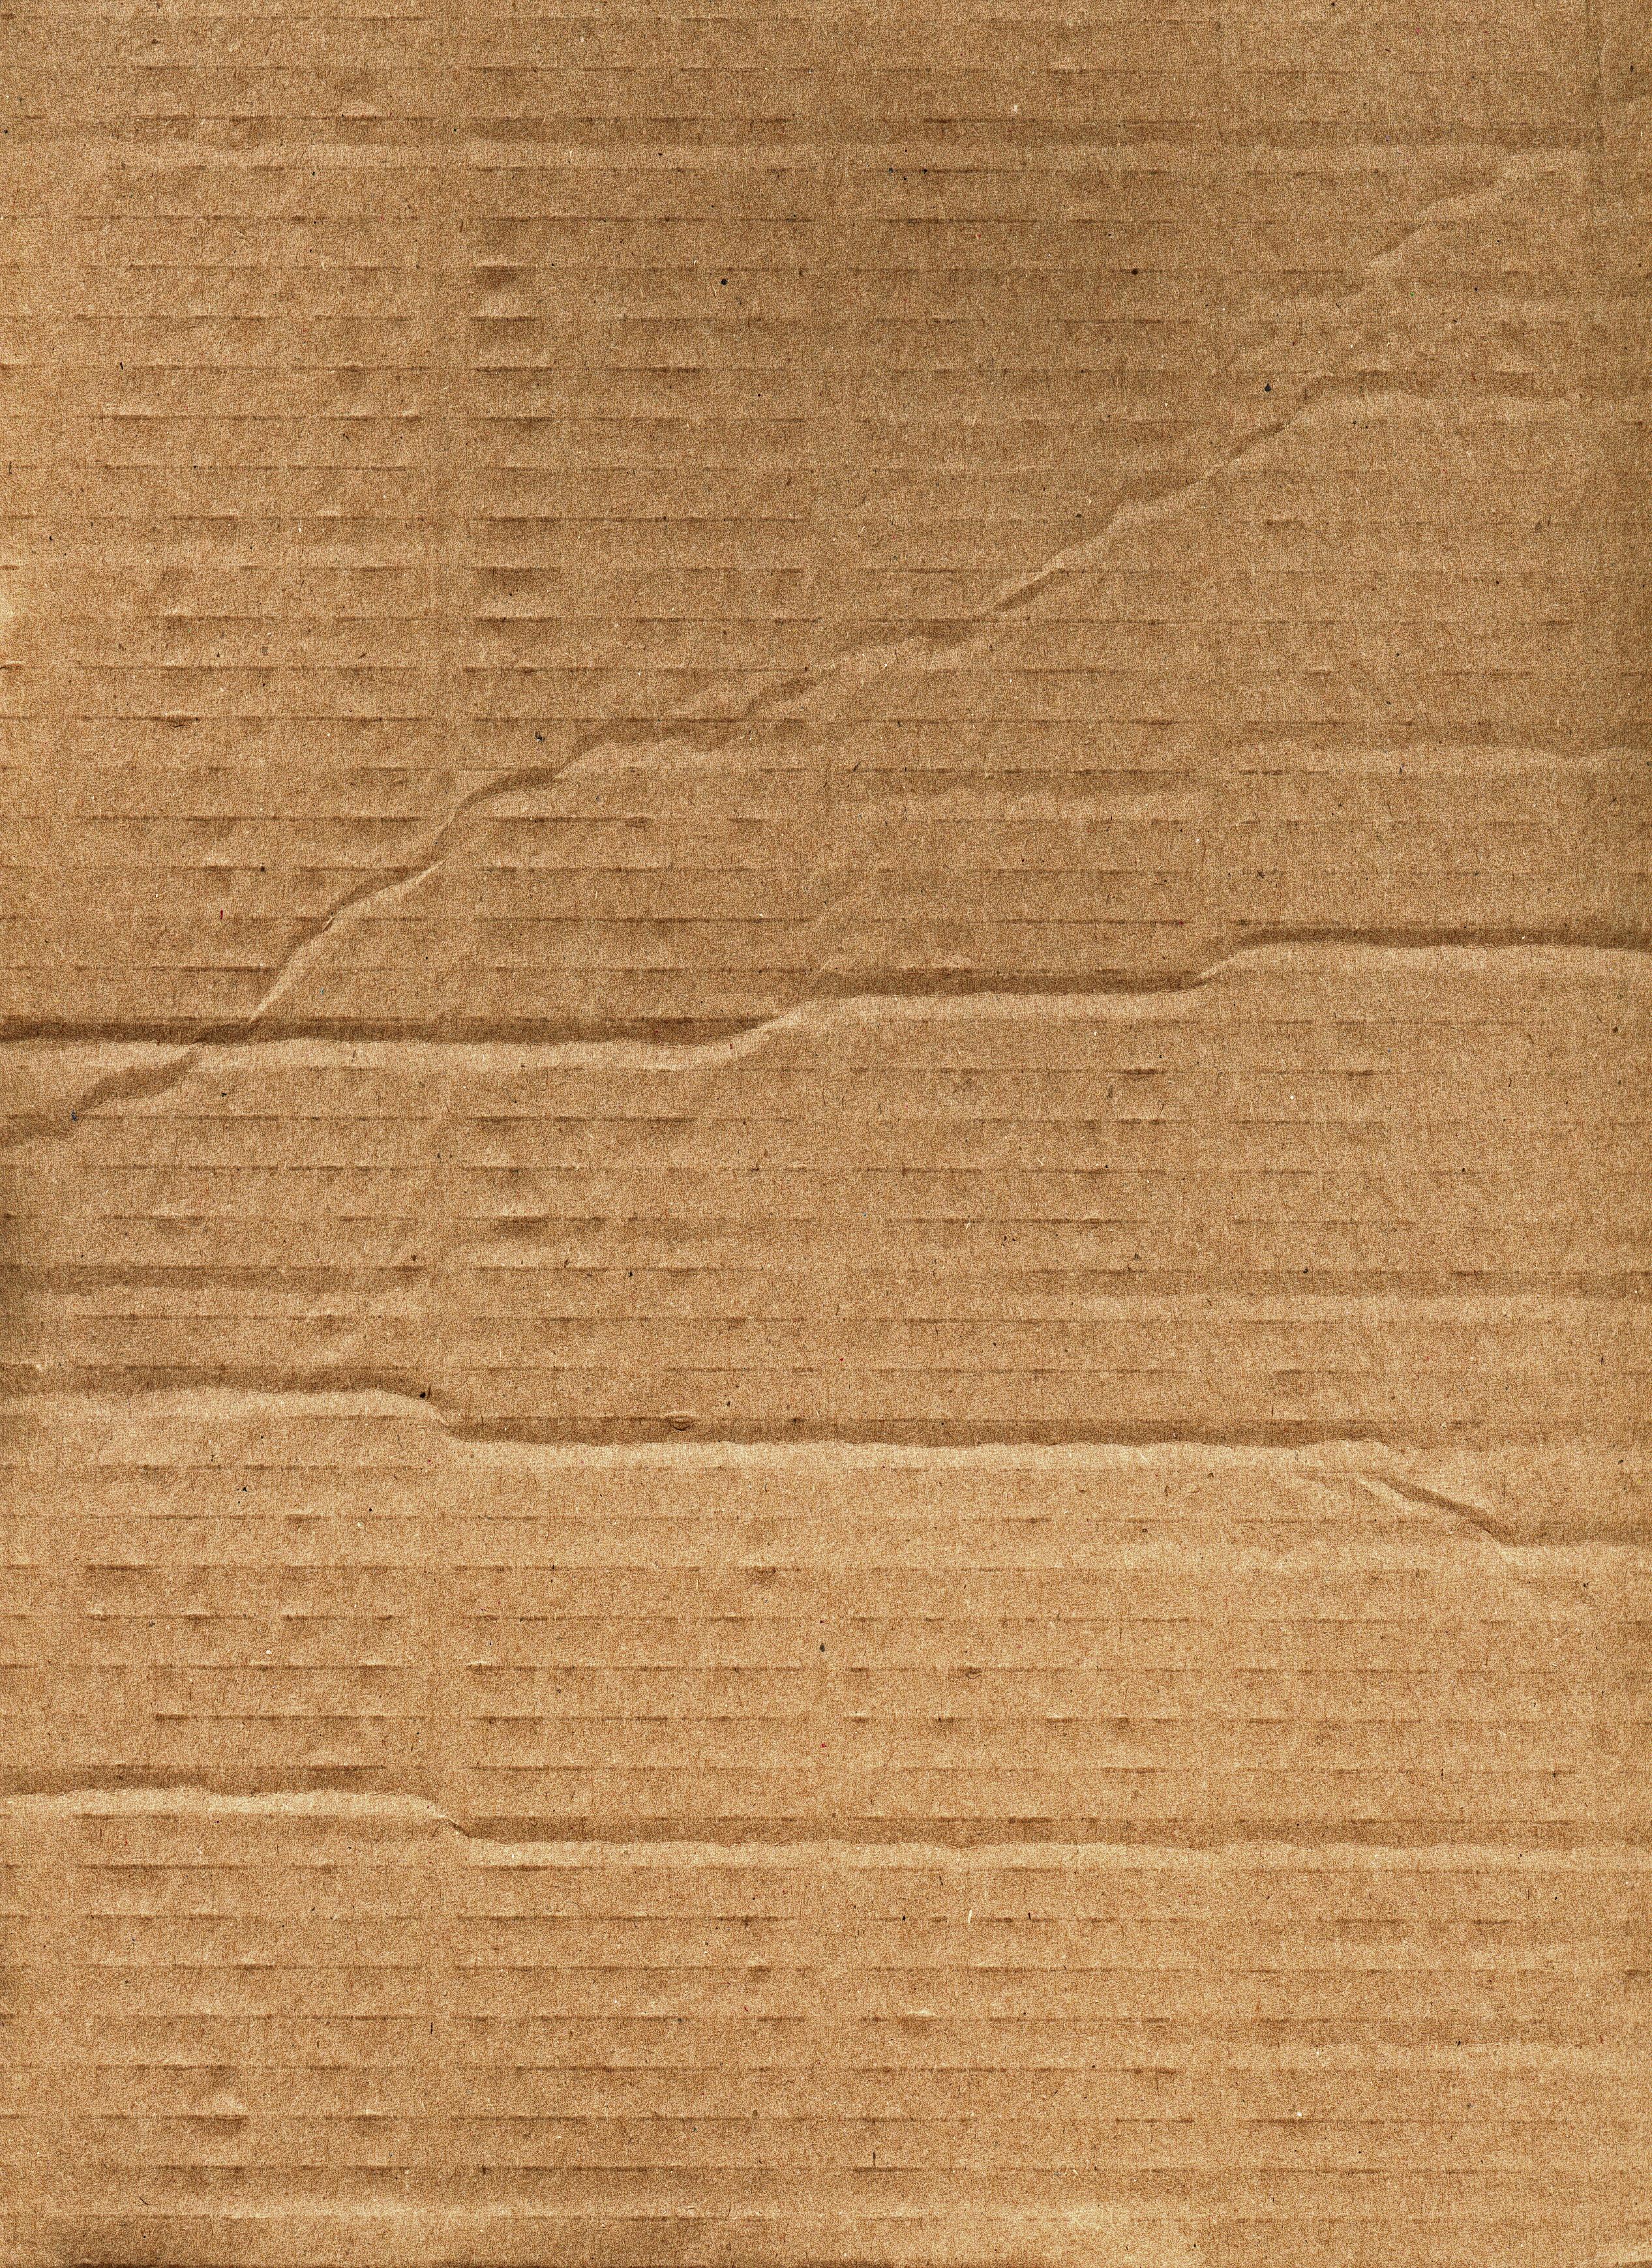 Untitled Texture XXVIII